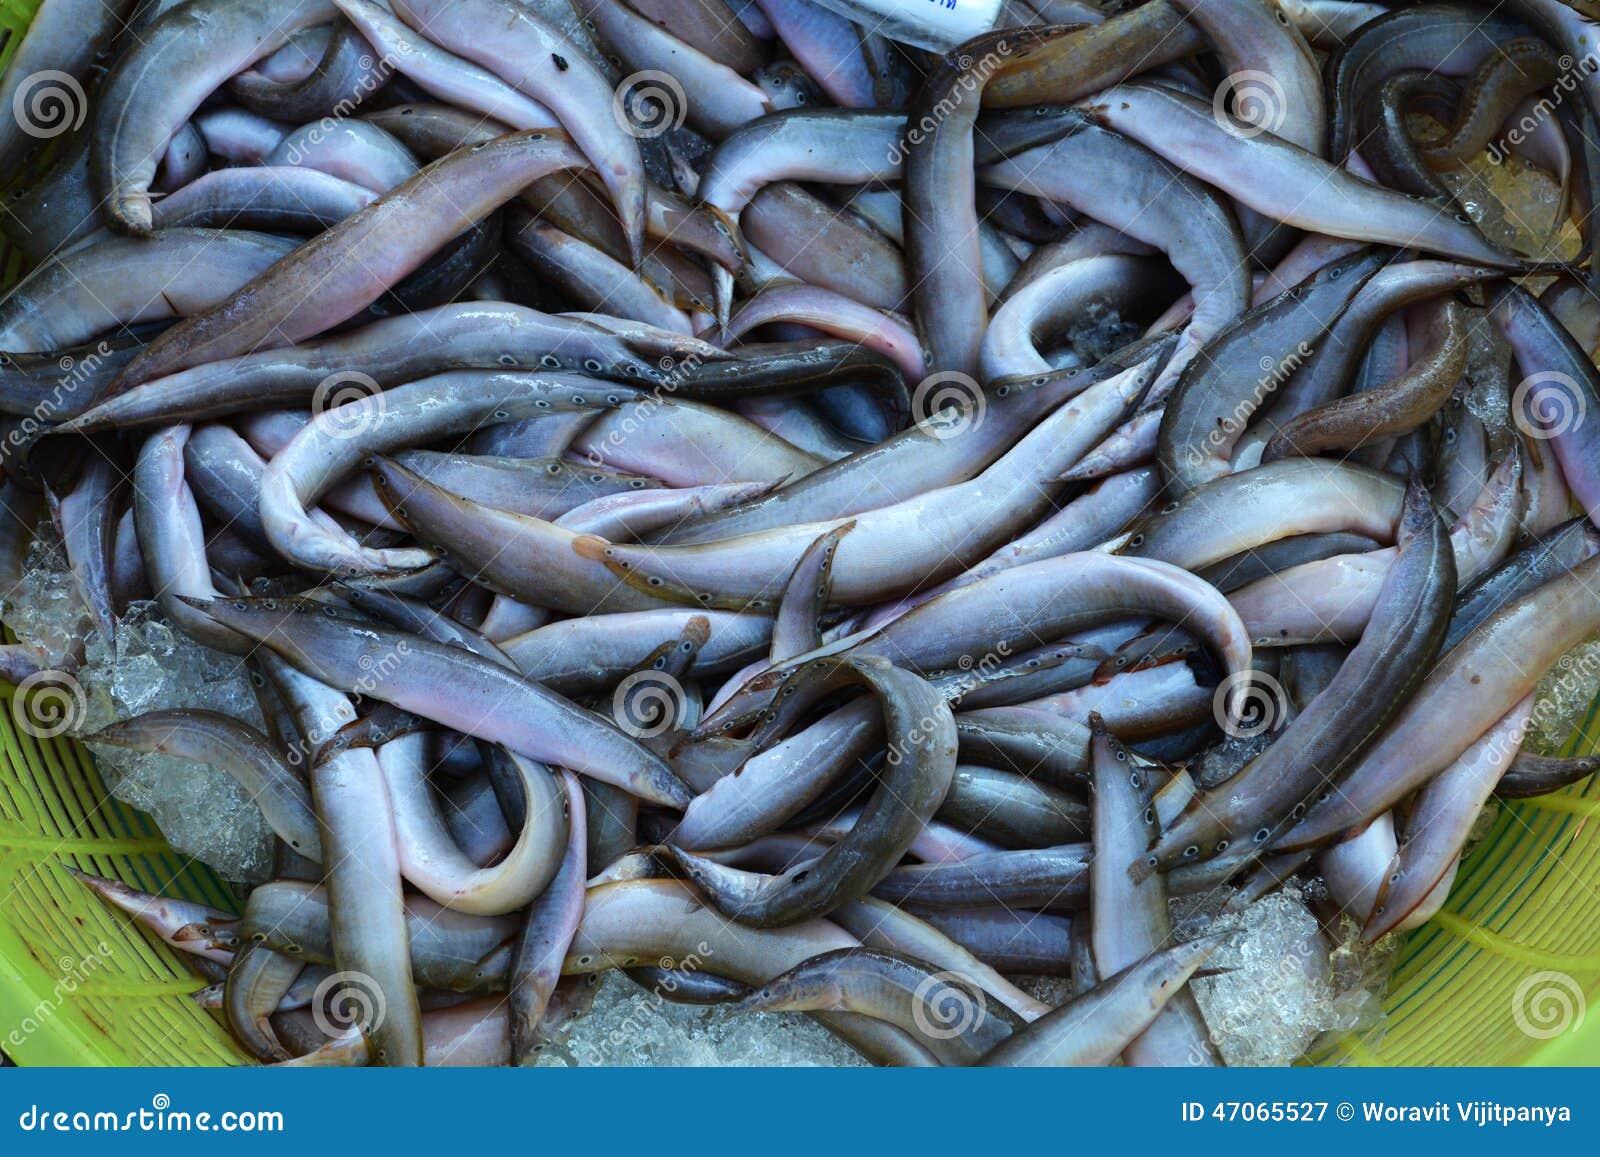 Spot Finned spiny eel in the market.